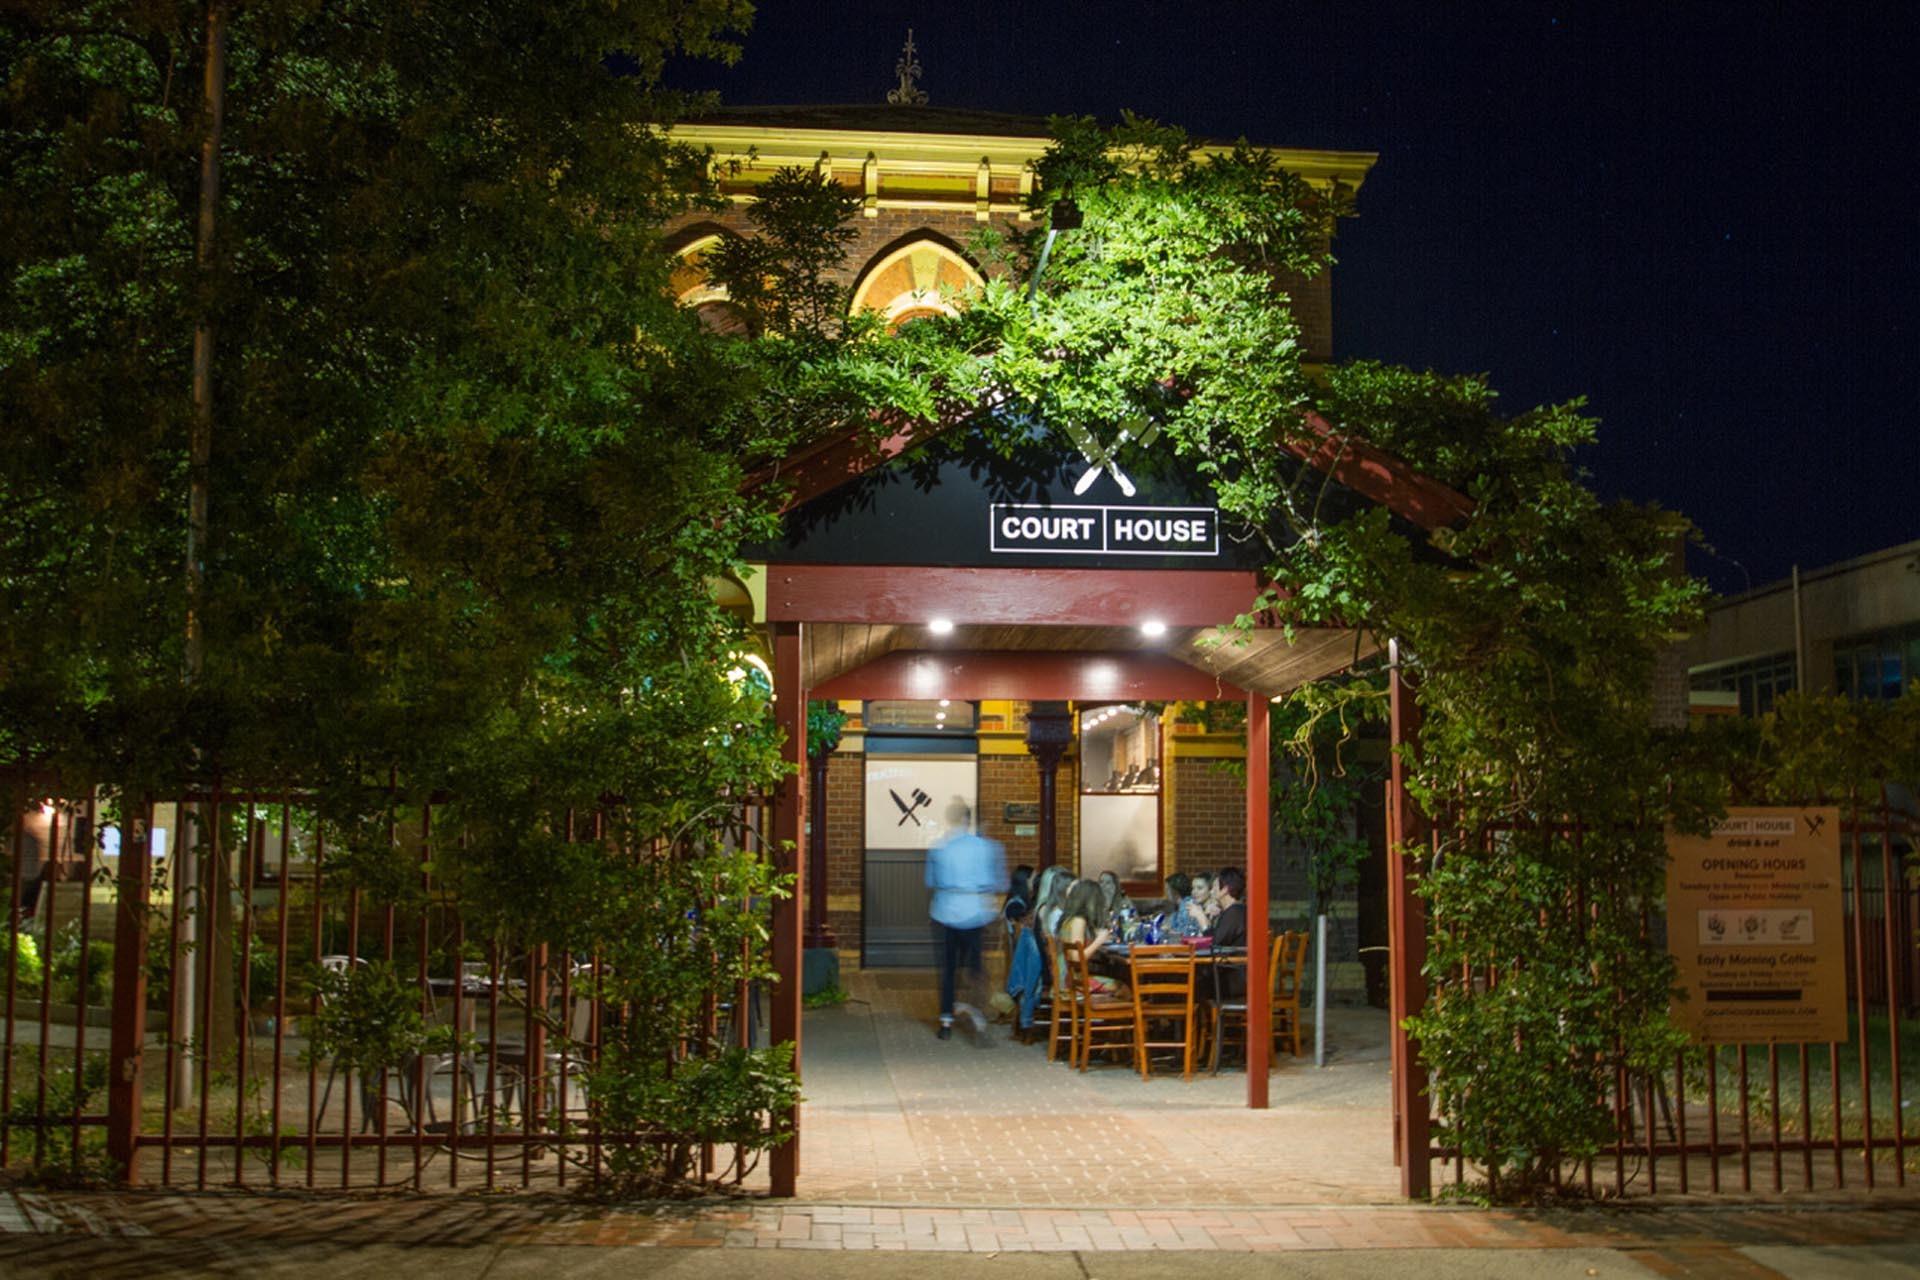 g - Courthouse Restaurant